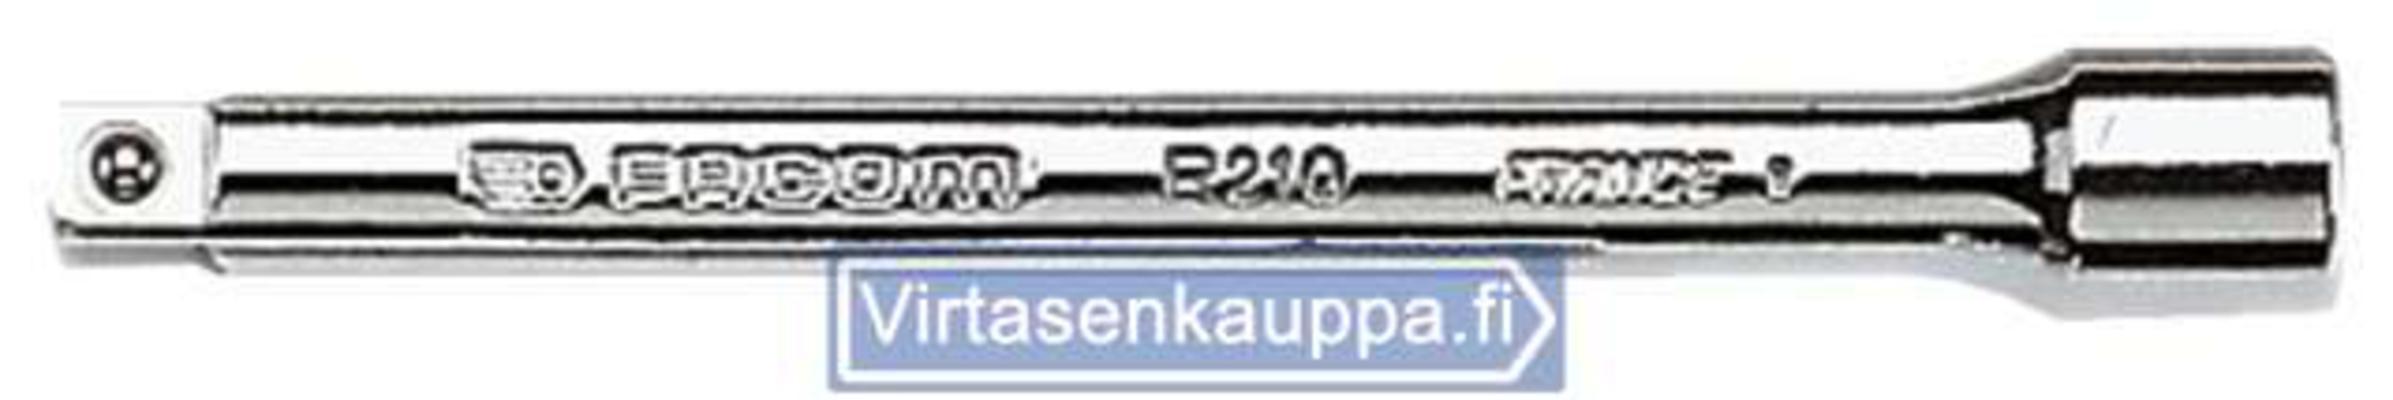 "Jatkovarsi 1/4"", Facom R.210 - Jatkovarsi 1/4"""